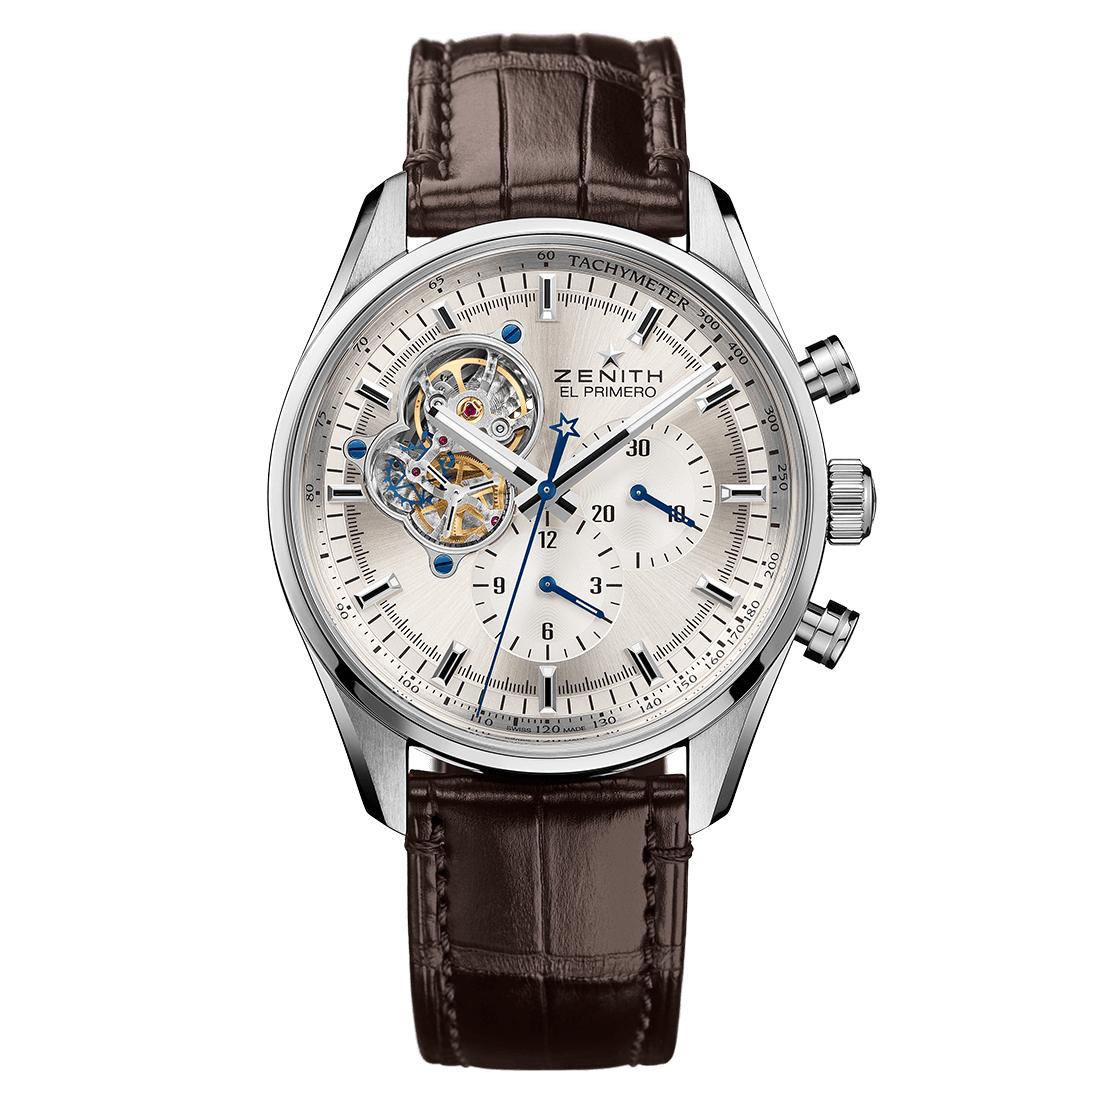 Reloj Zenith - Chronomaster, El Primero Open - 03.2040.4061/01.C494 - Amaya Joyeros